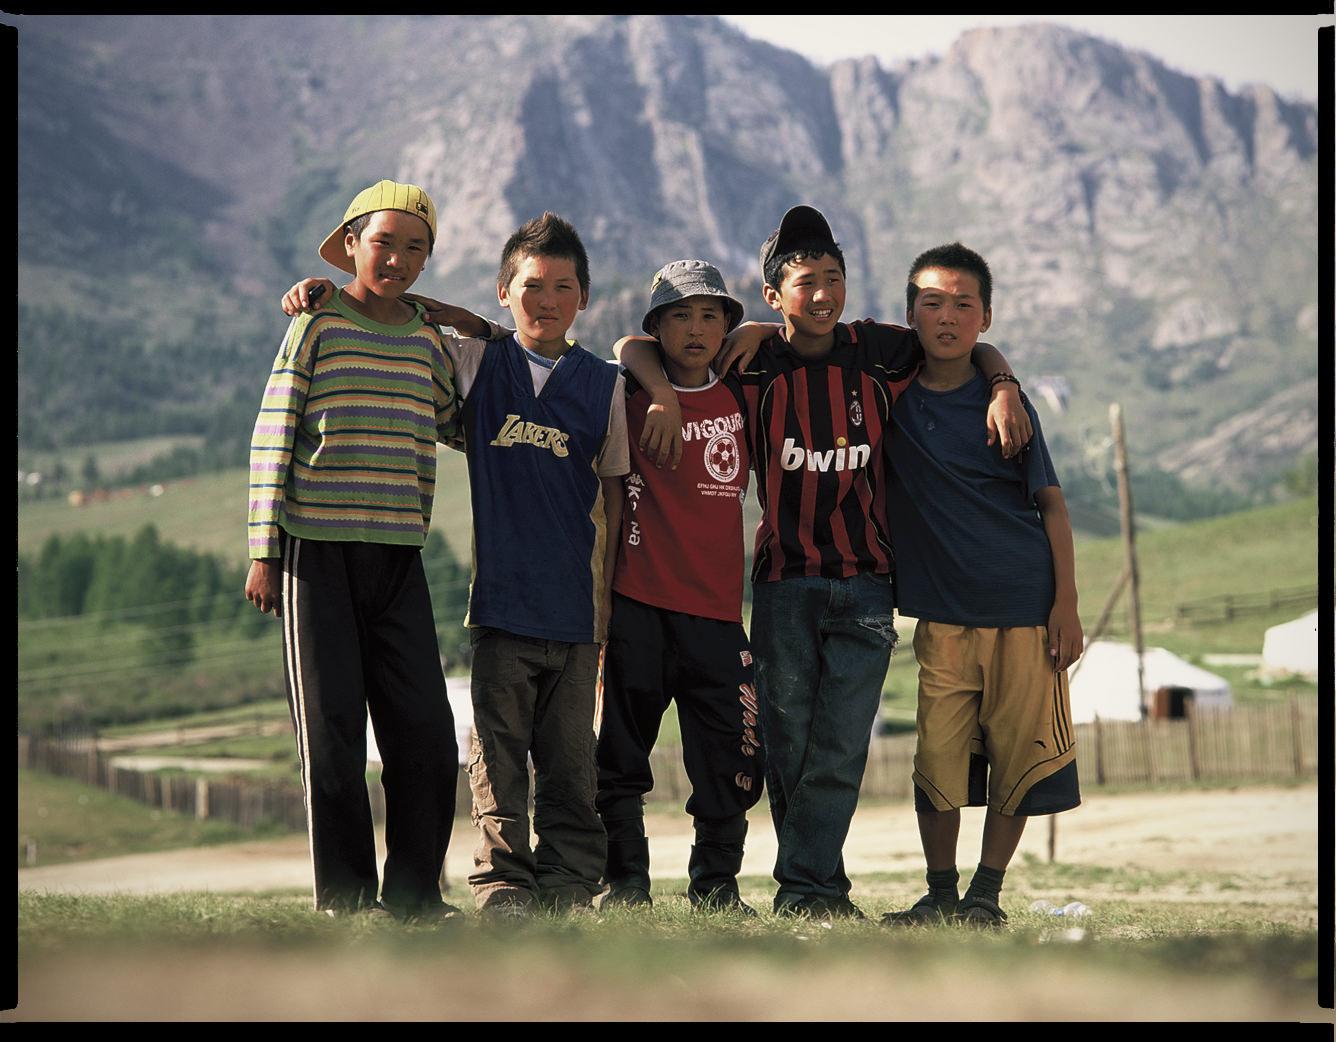 MediumFormatPatrikWallner_Mongolia_MongoliaKidsLOWQ